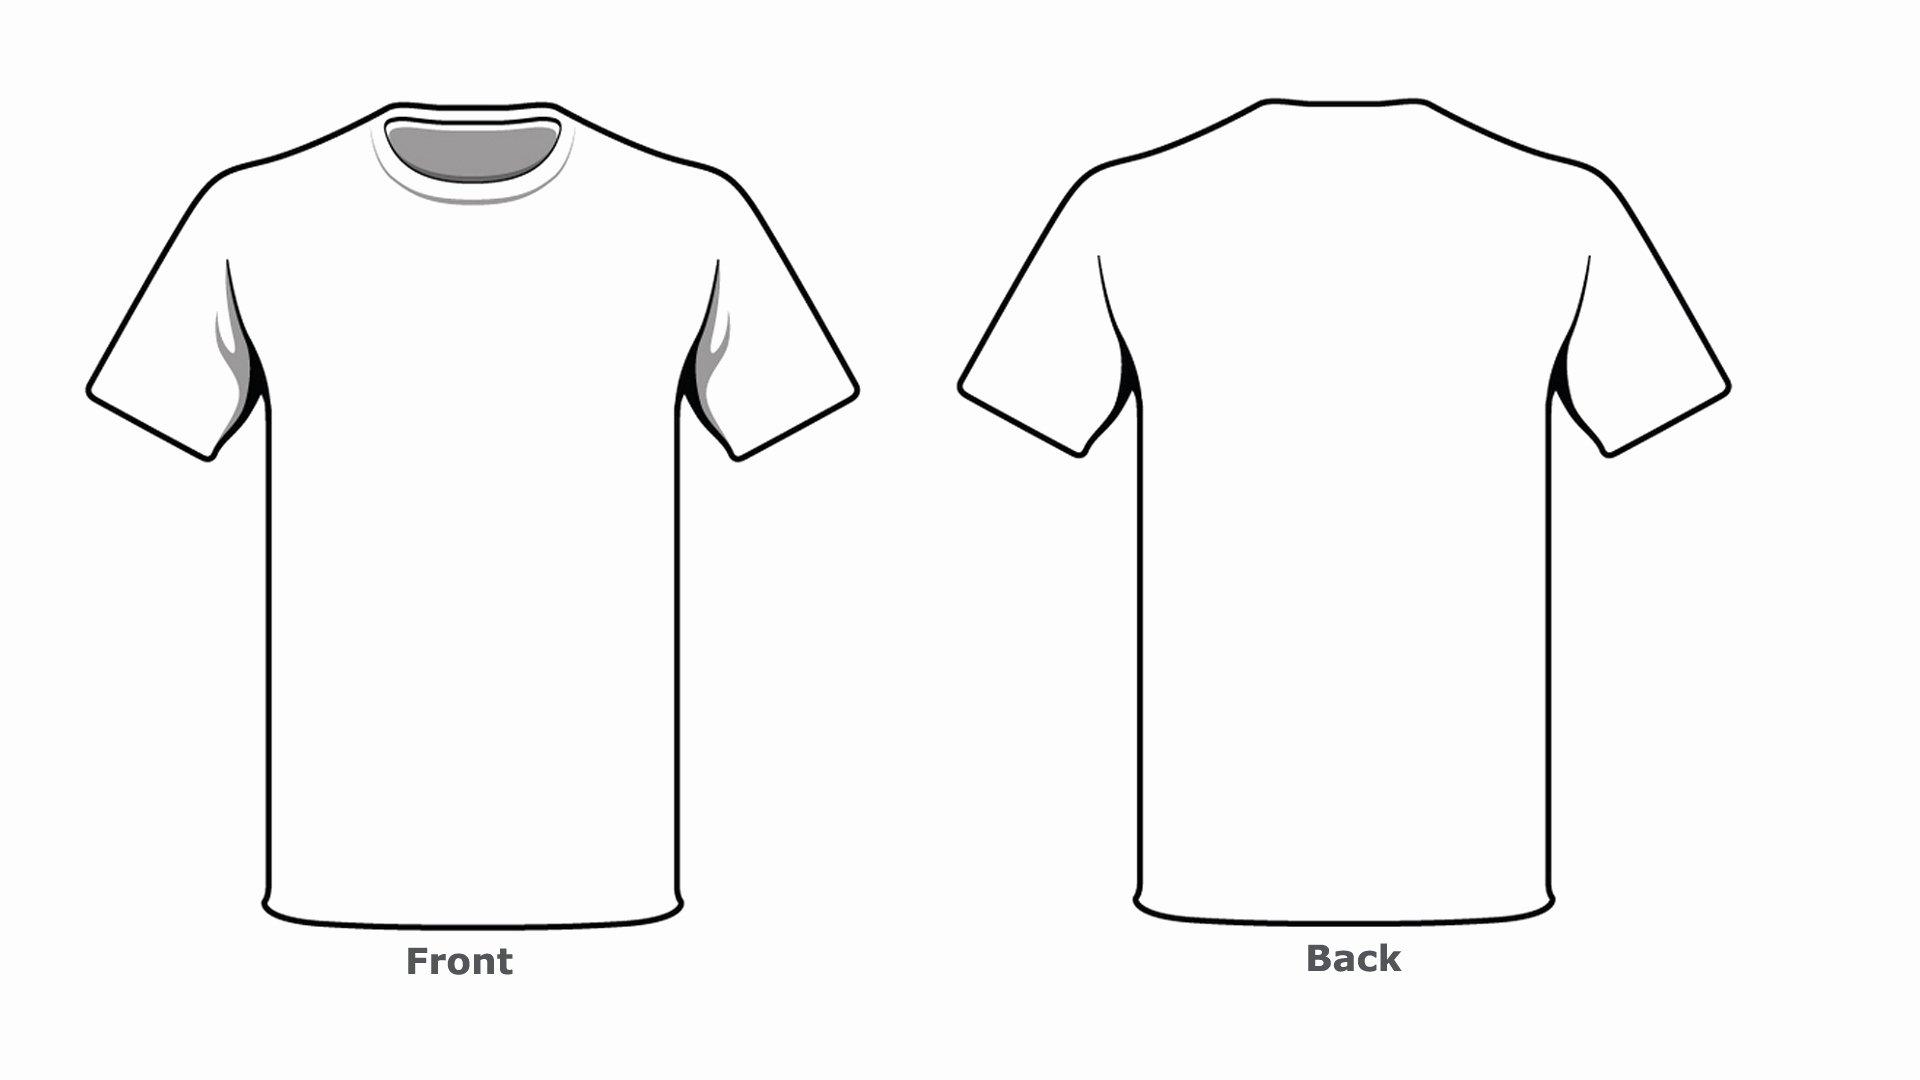 Blank Tshirt Template Elegant Blank Tshirt Template Front Back Side In High Resolution